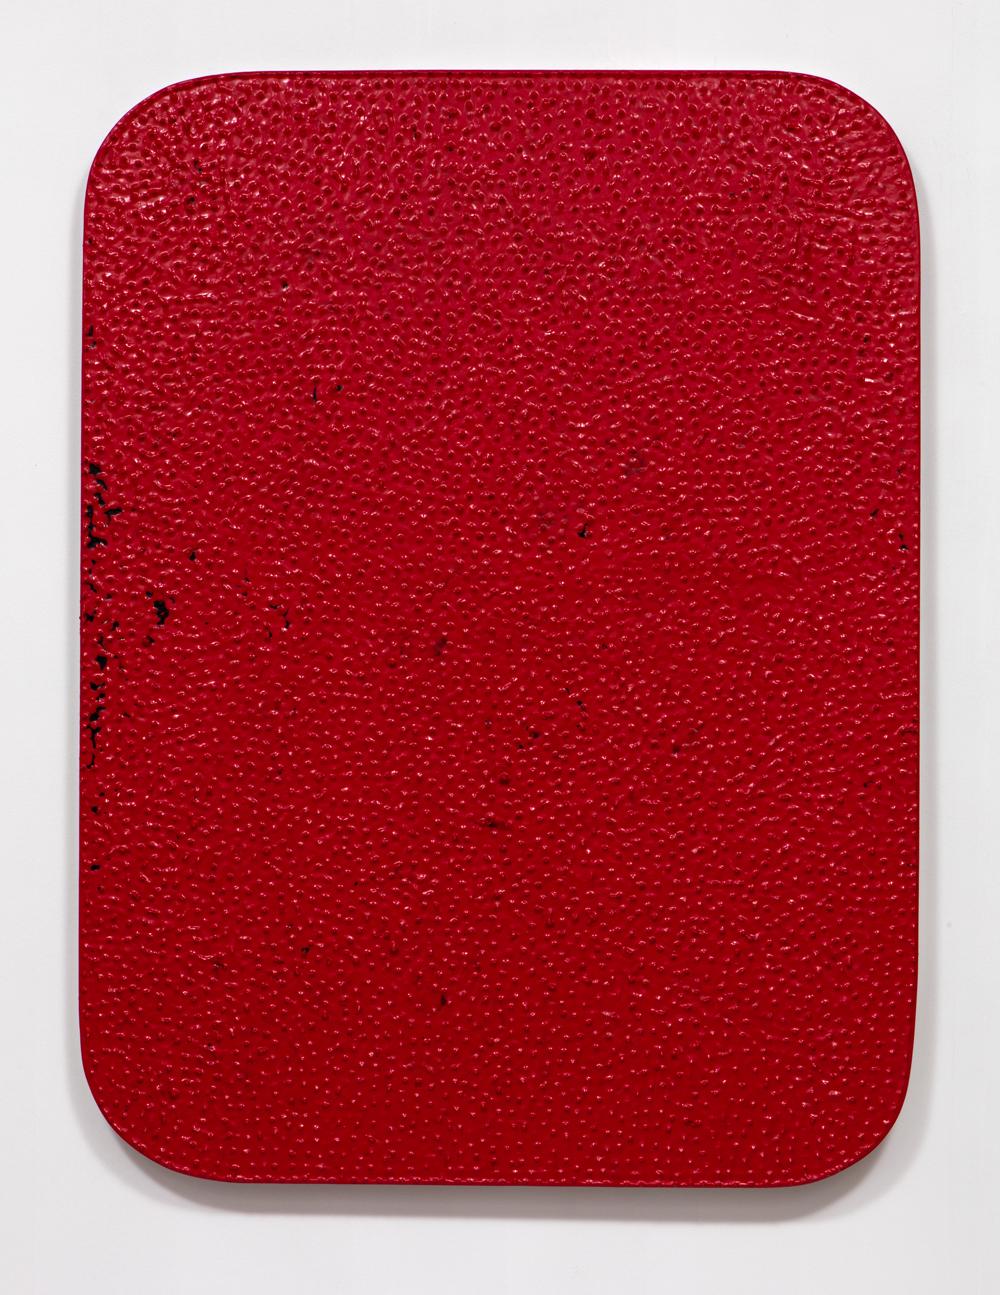 SLATE: Dip Painting No. 4 (1b, 1r, 1b, 1r)  , 2015 Valspar Reserve Semi-Gloss Interior Paint, Valspar Signature Satin Interior Painting and Dipping on custom panel 48 x 36 inches